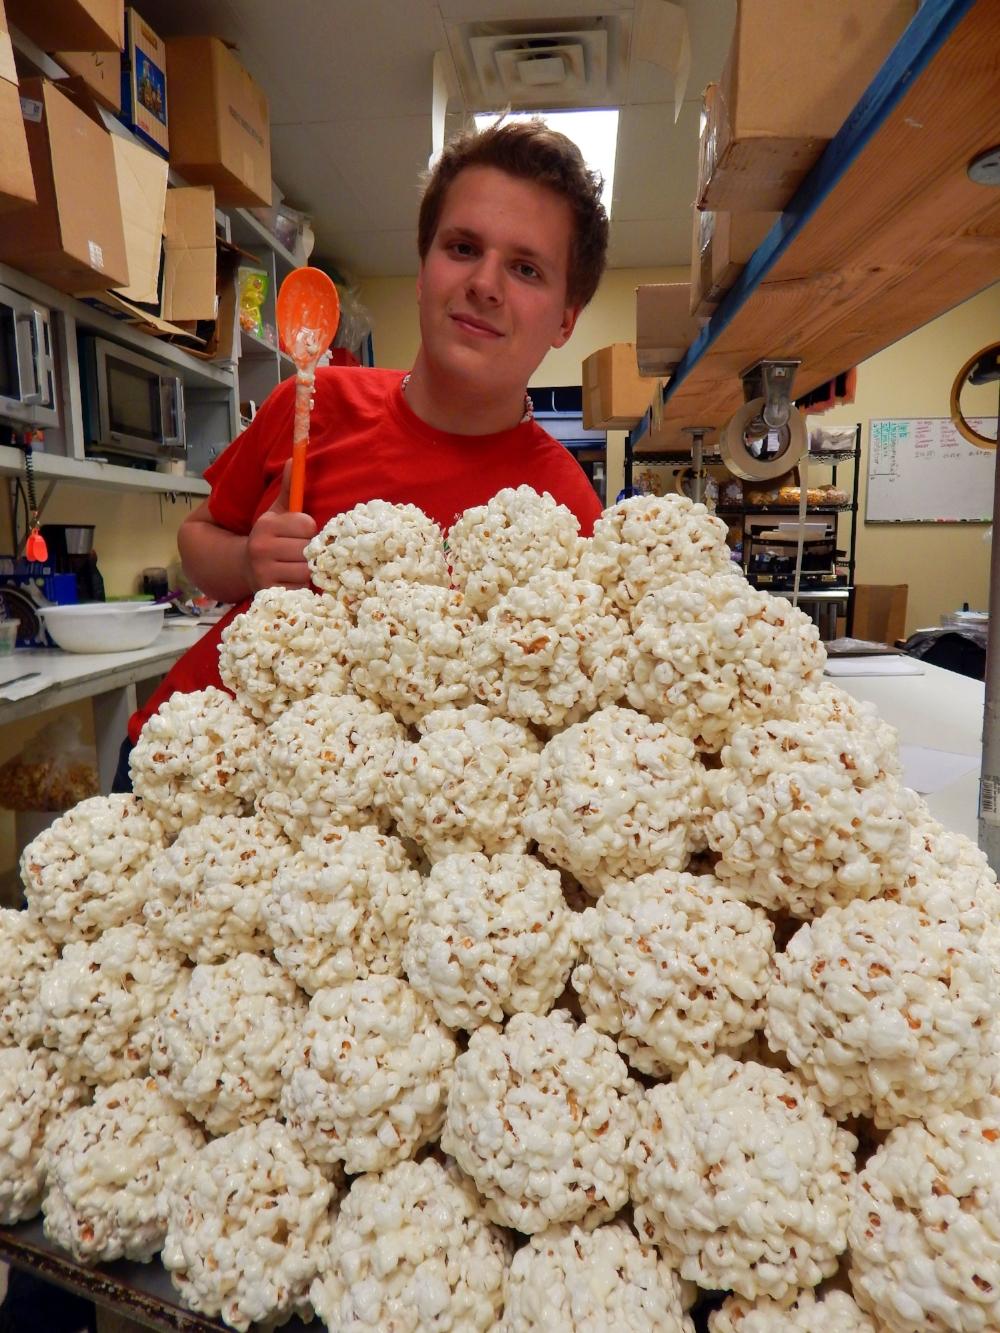 Our Popcorn Ball Machine